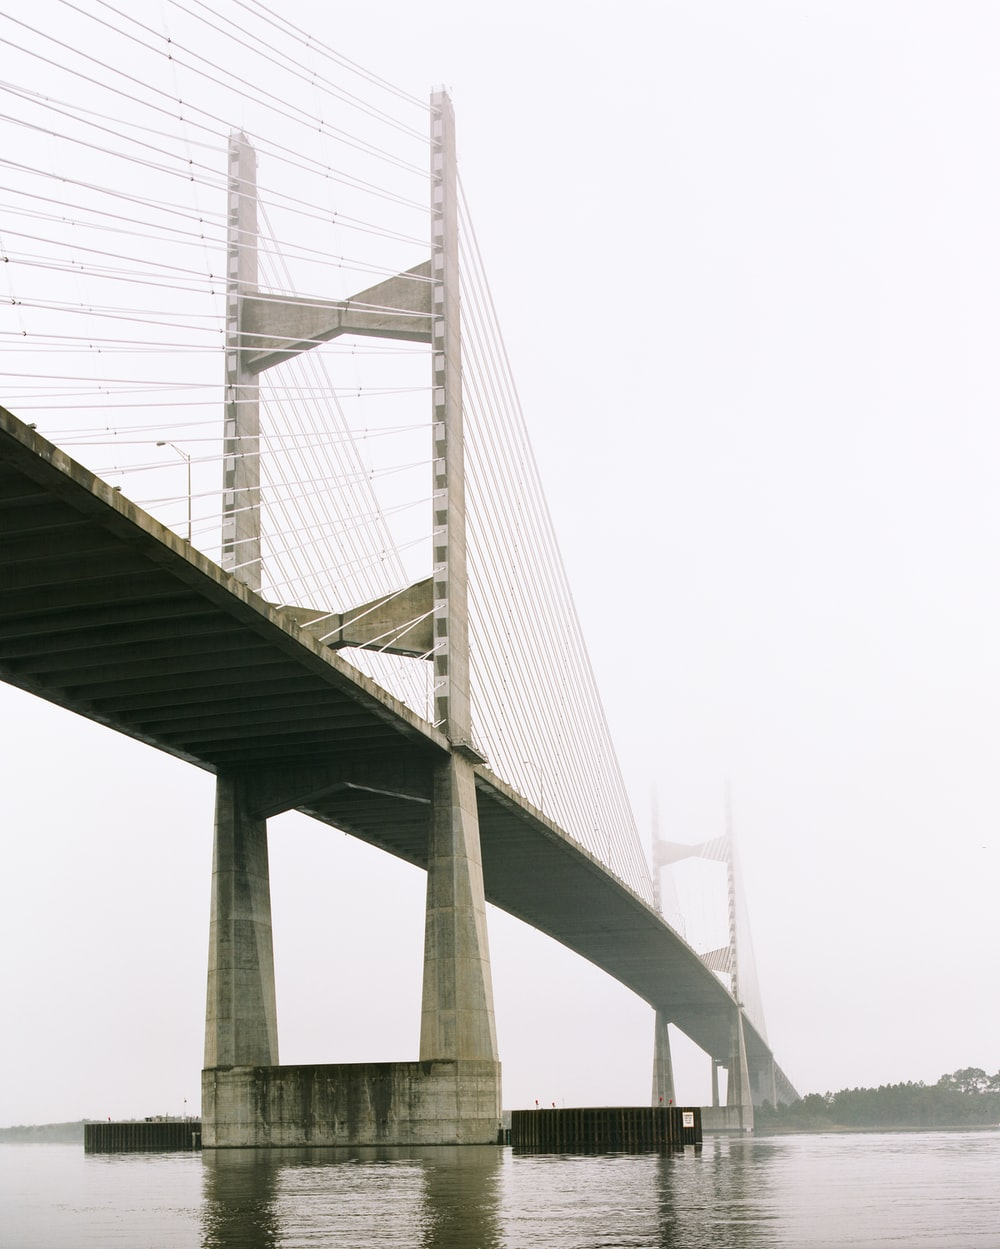 self-anchored suspension bridge during daytime